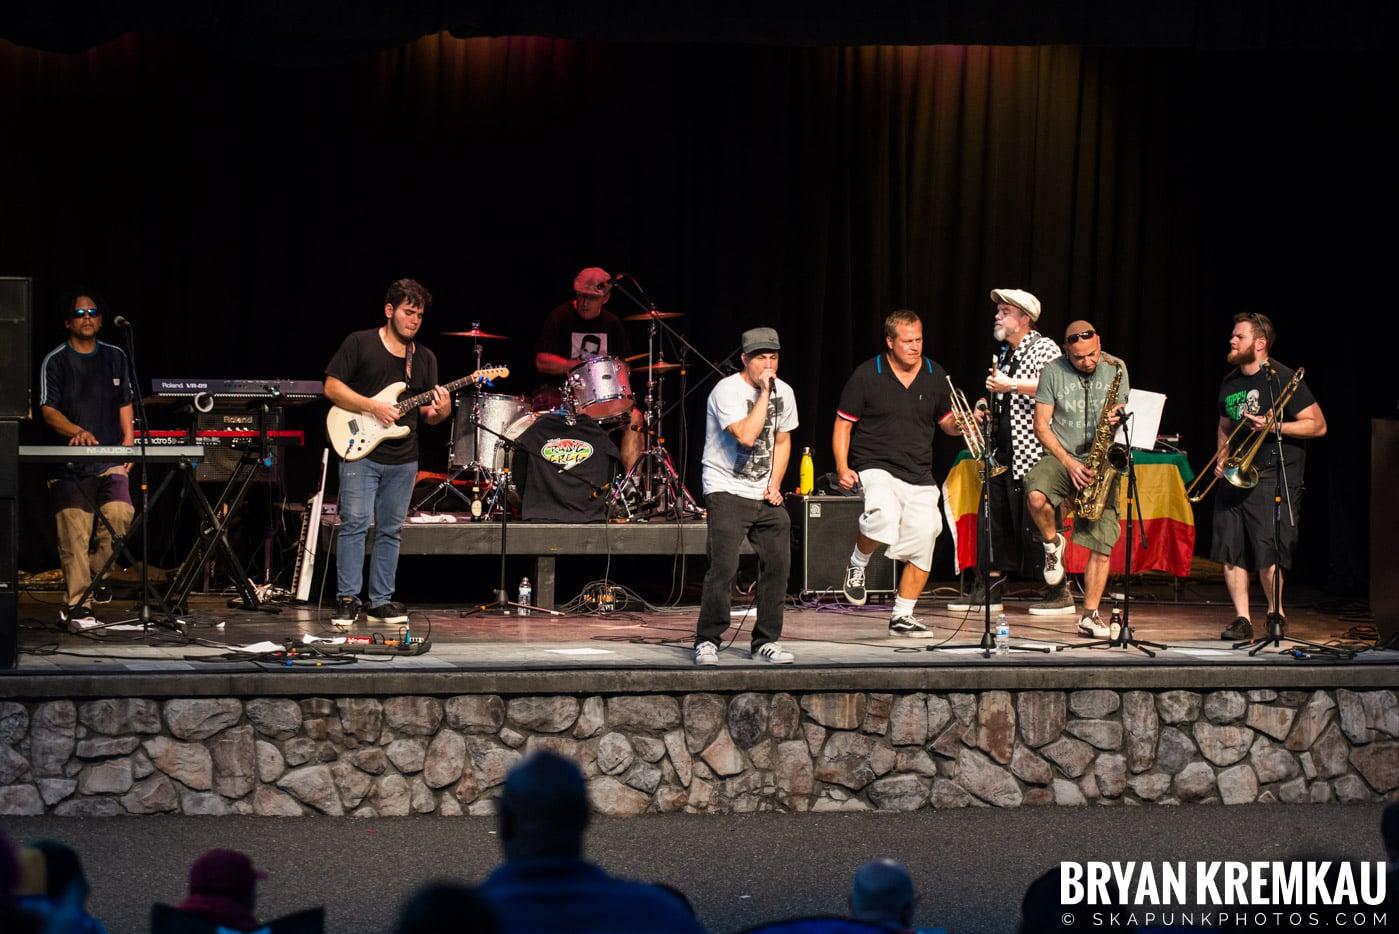 The Rudie Crew @ Oskar Schindler Performing Arts Center, West Orange, NJ - 8.19.17 (8)